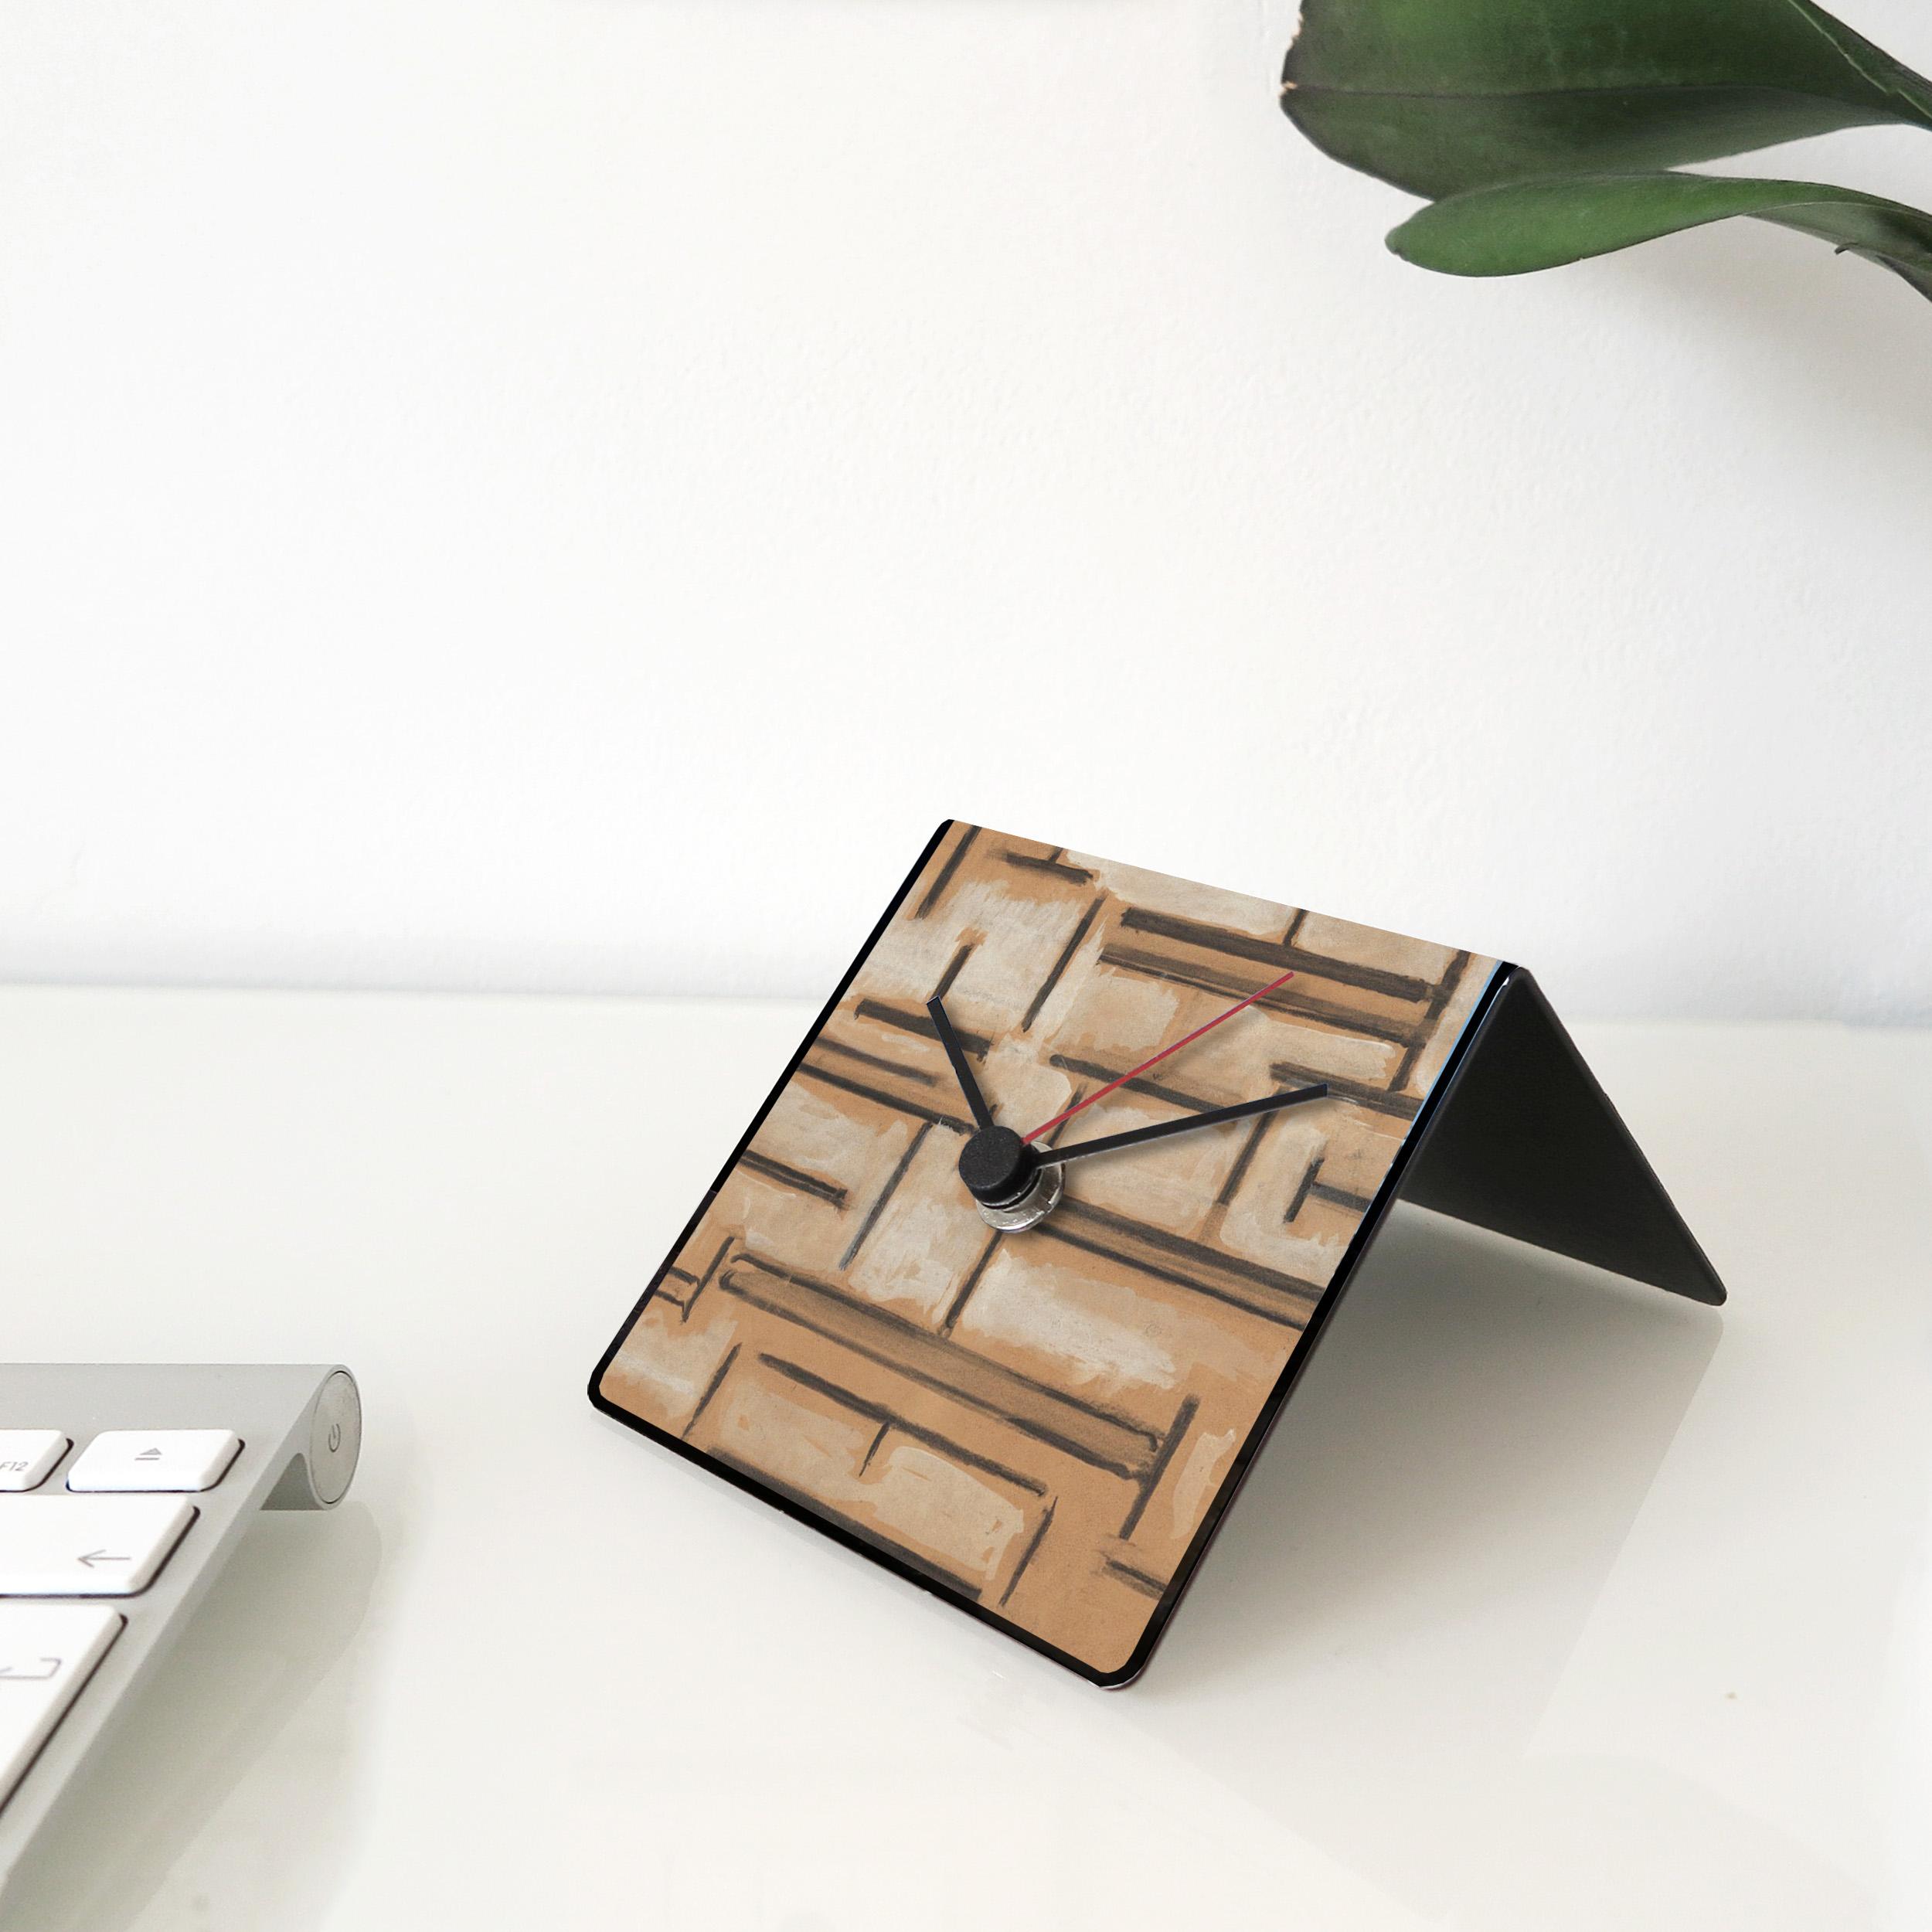 desk clock Mondrian Peggy Guggenheim Collection